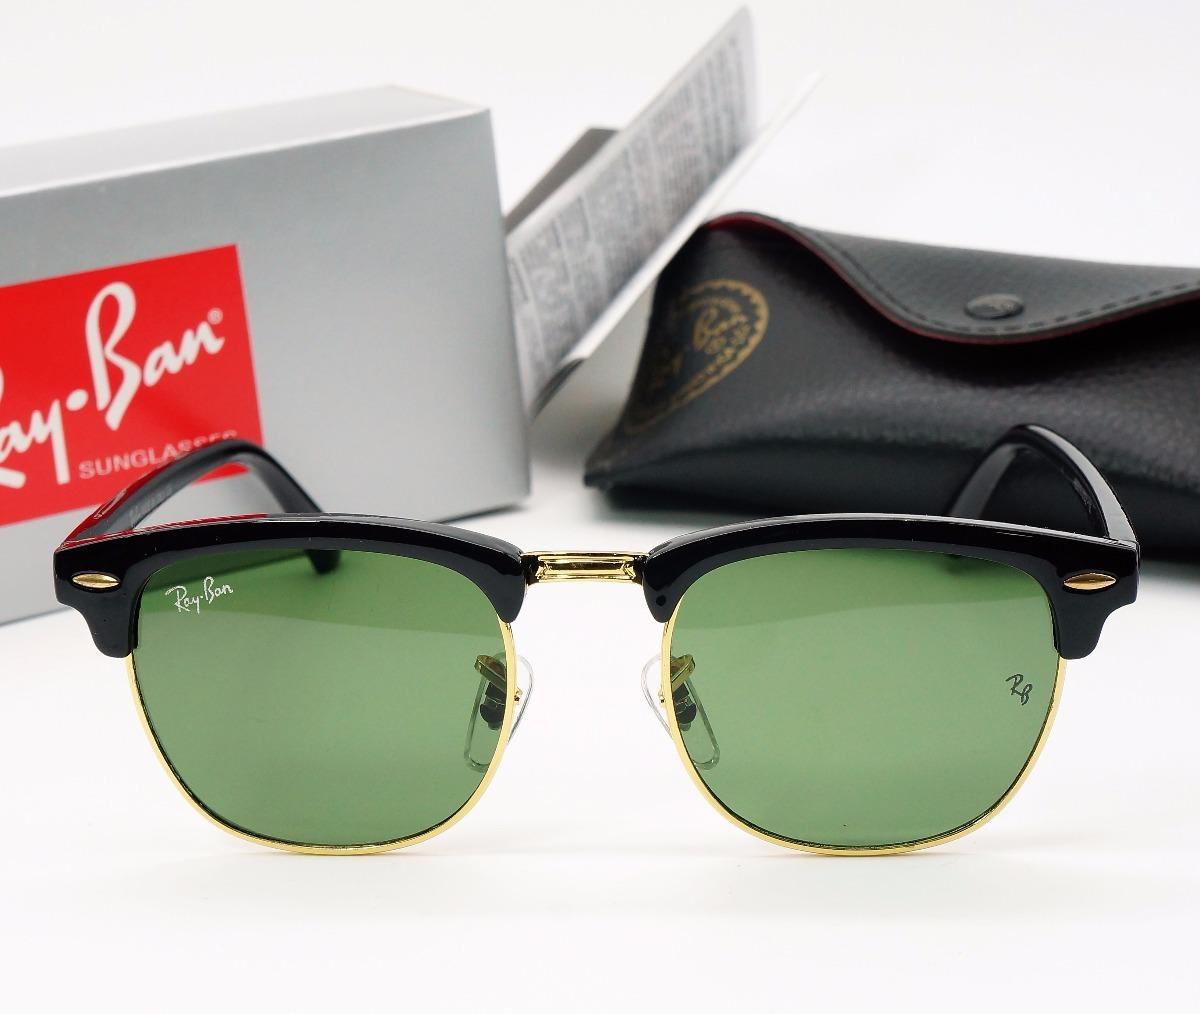 2b04b9442 oculos sol ray ban clubmaster retro quadrado preto tartaruga. Carregando  zoom.